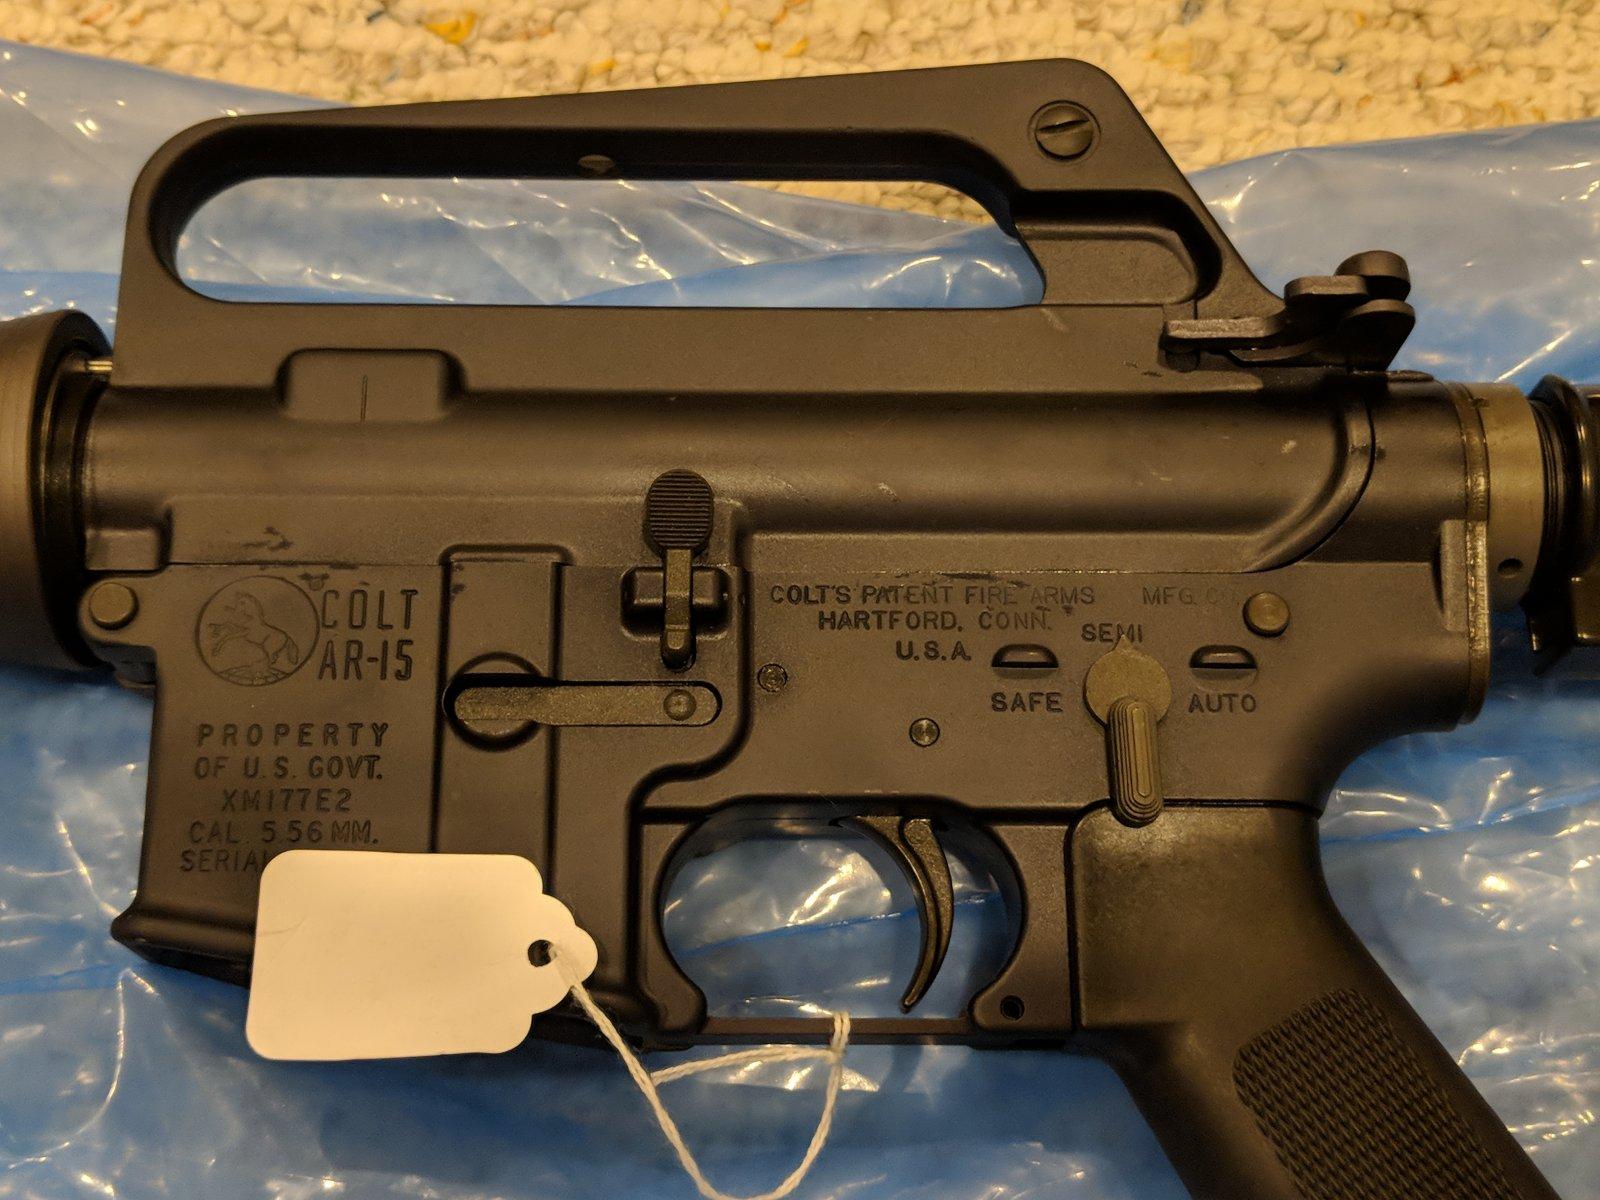 Colt XM177E2 re-issue